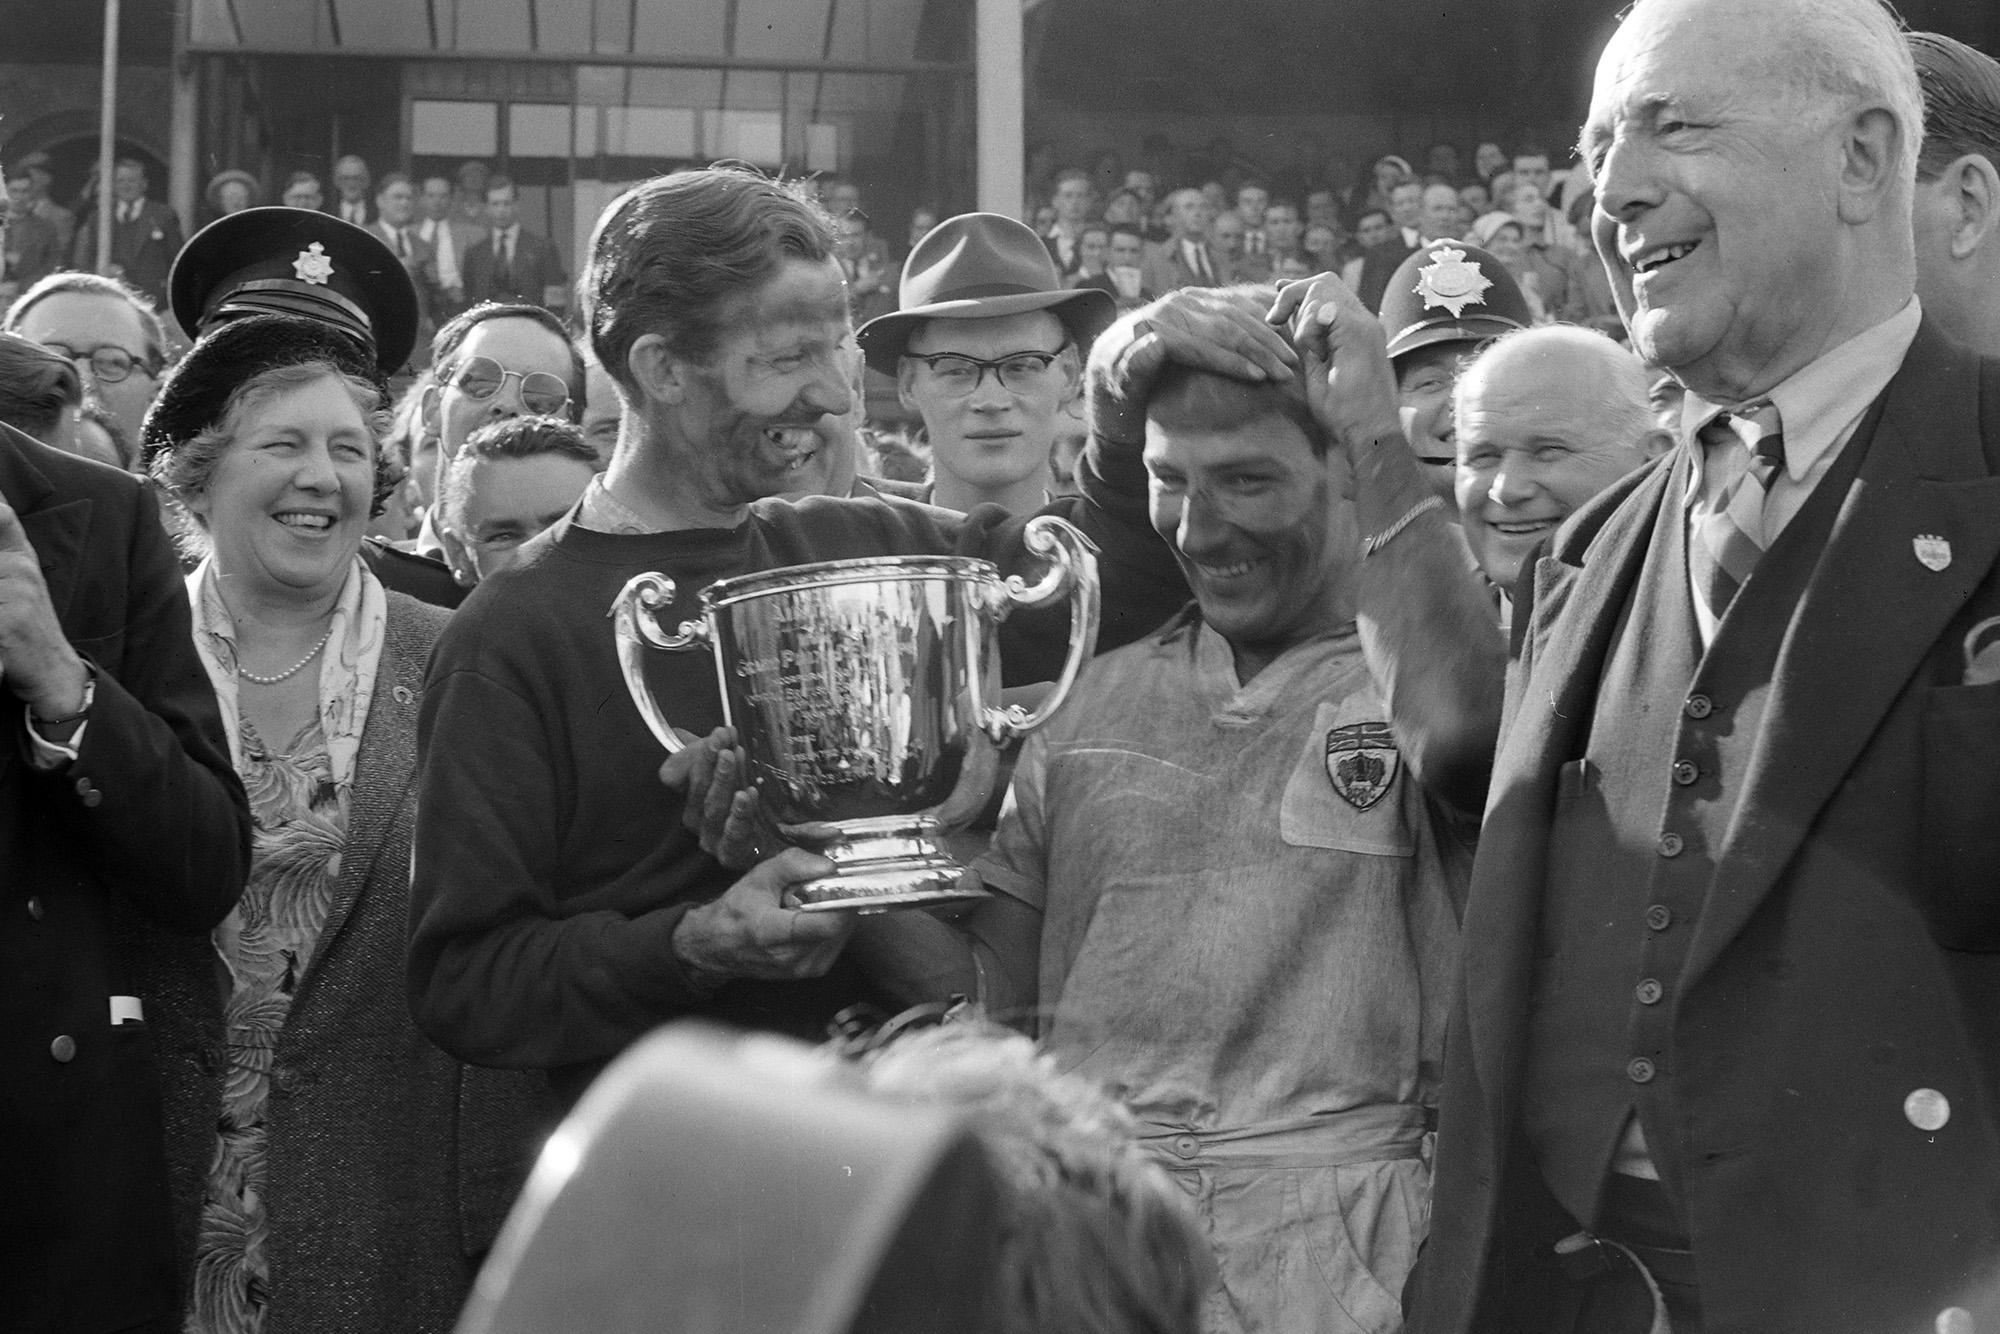 Tony Brooks and Stirling Moss celebrate after winning the 1957 British Grand Prix